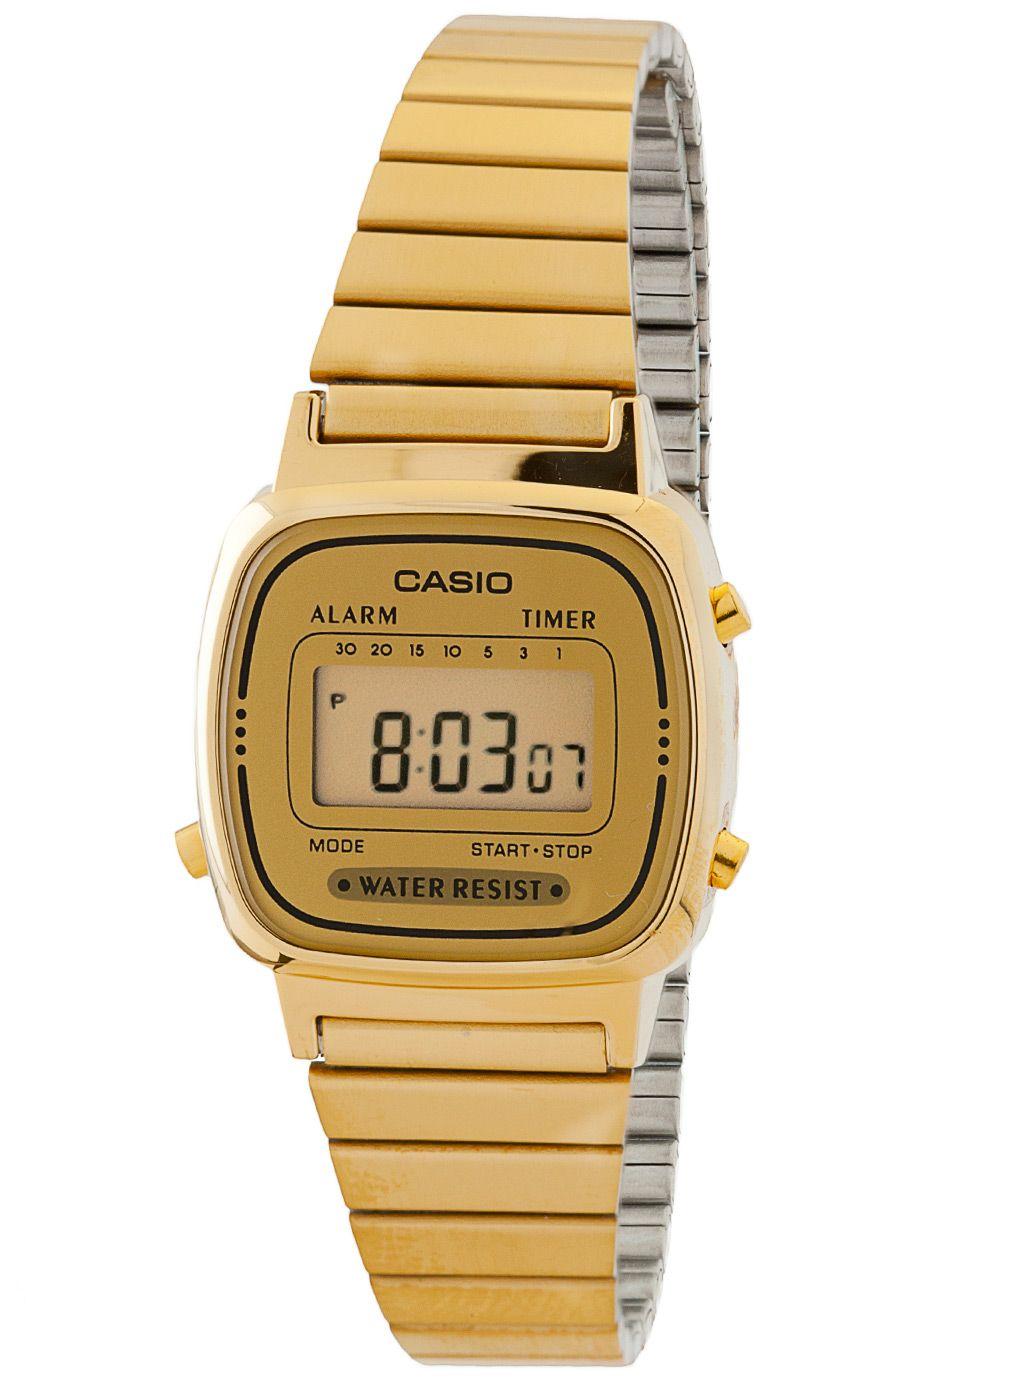 la670wga 9 casio gold digital american apparel